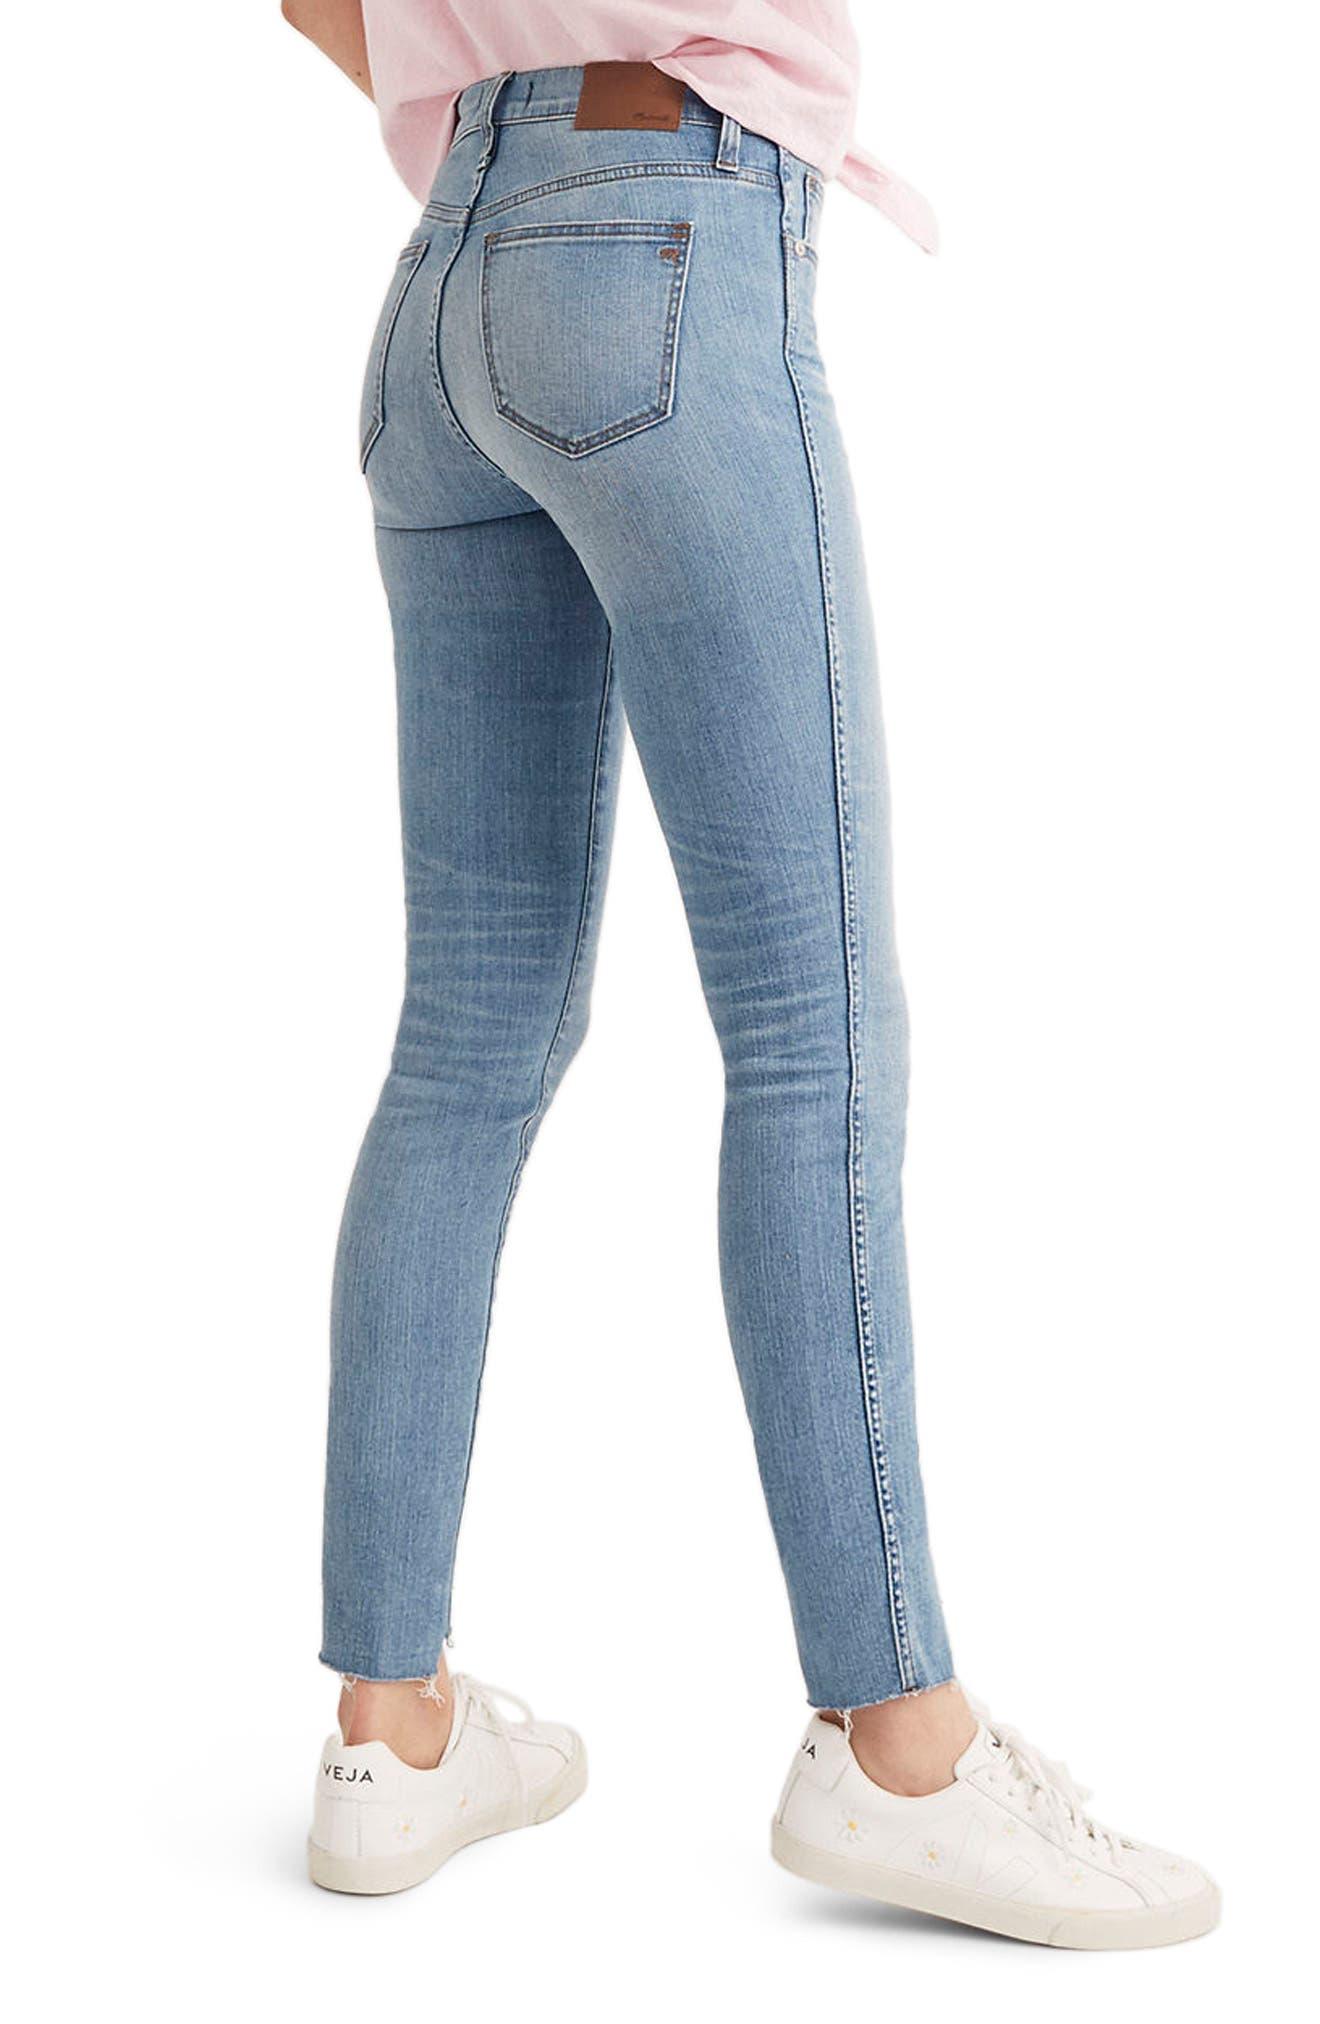 9-Inch High Waist Seamed Step-Hem Edition Skinny Jeans,                             Alternate thumbnail 2, color,                             August